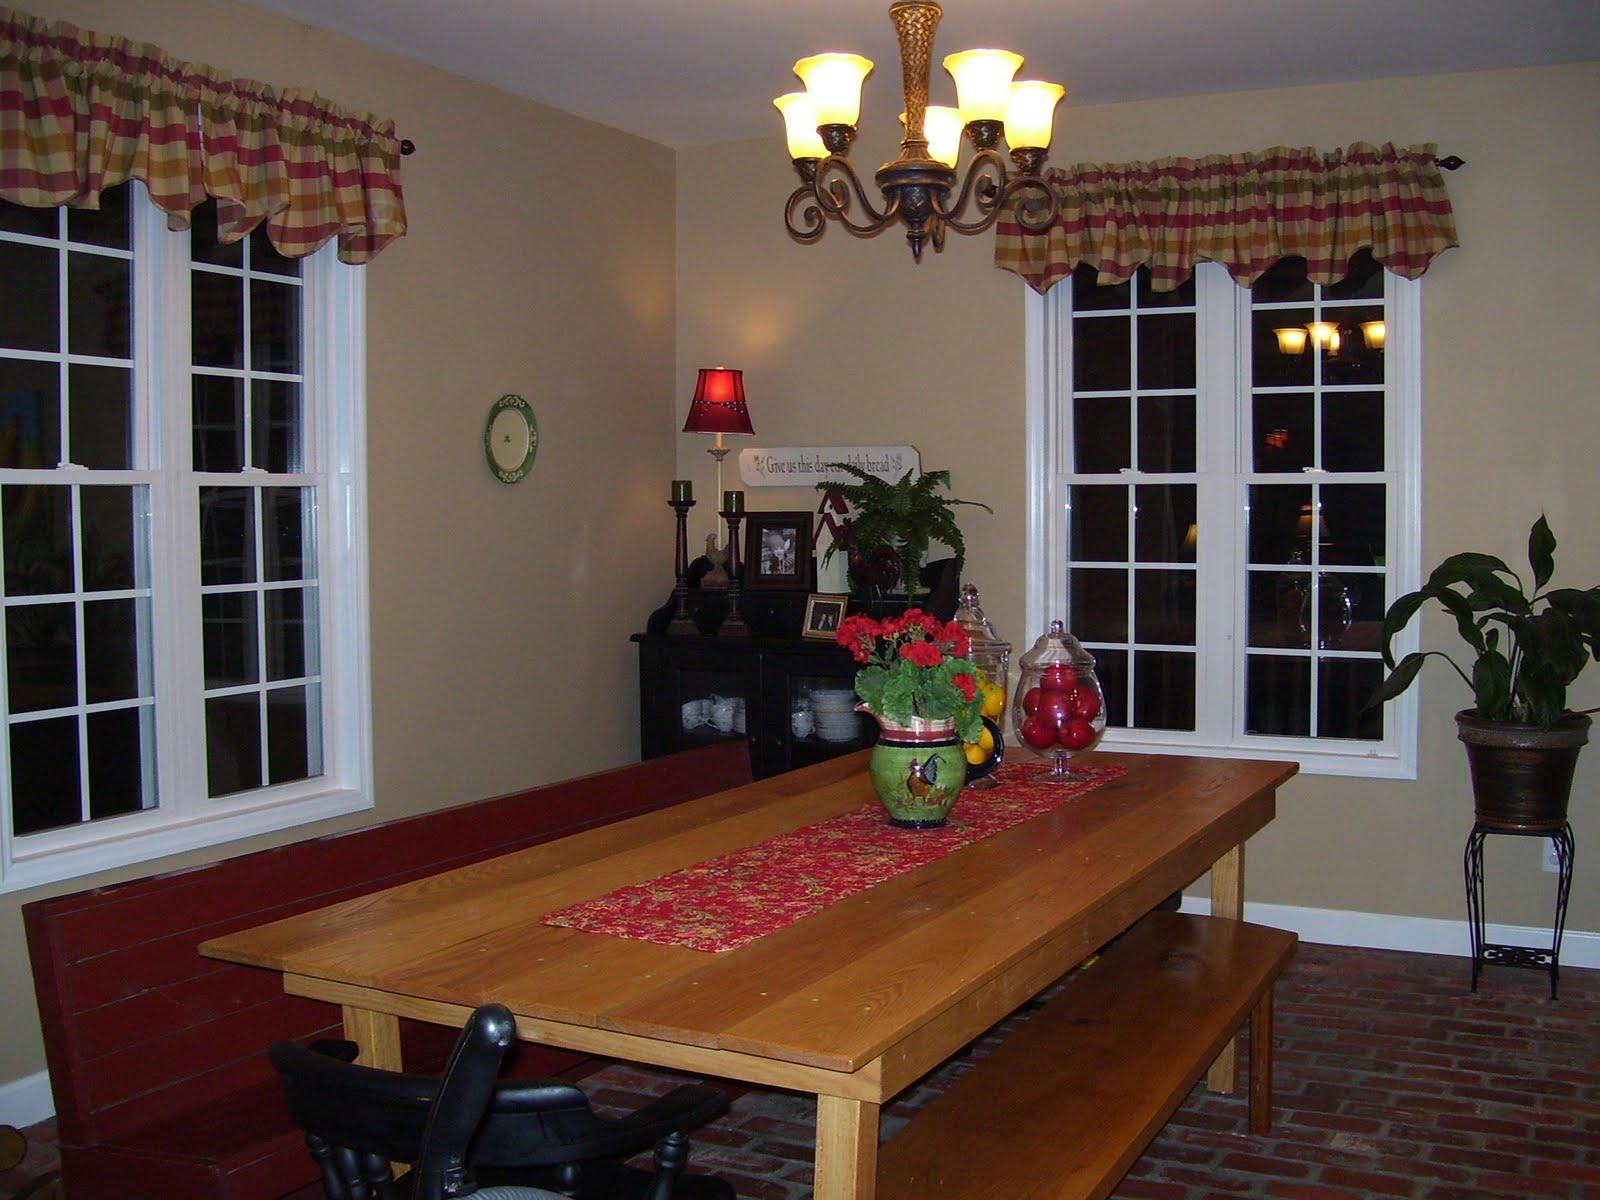 Broyhill Attic Heirloom Dining Table Sweet Jane Dining Room